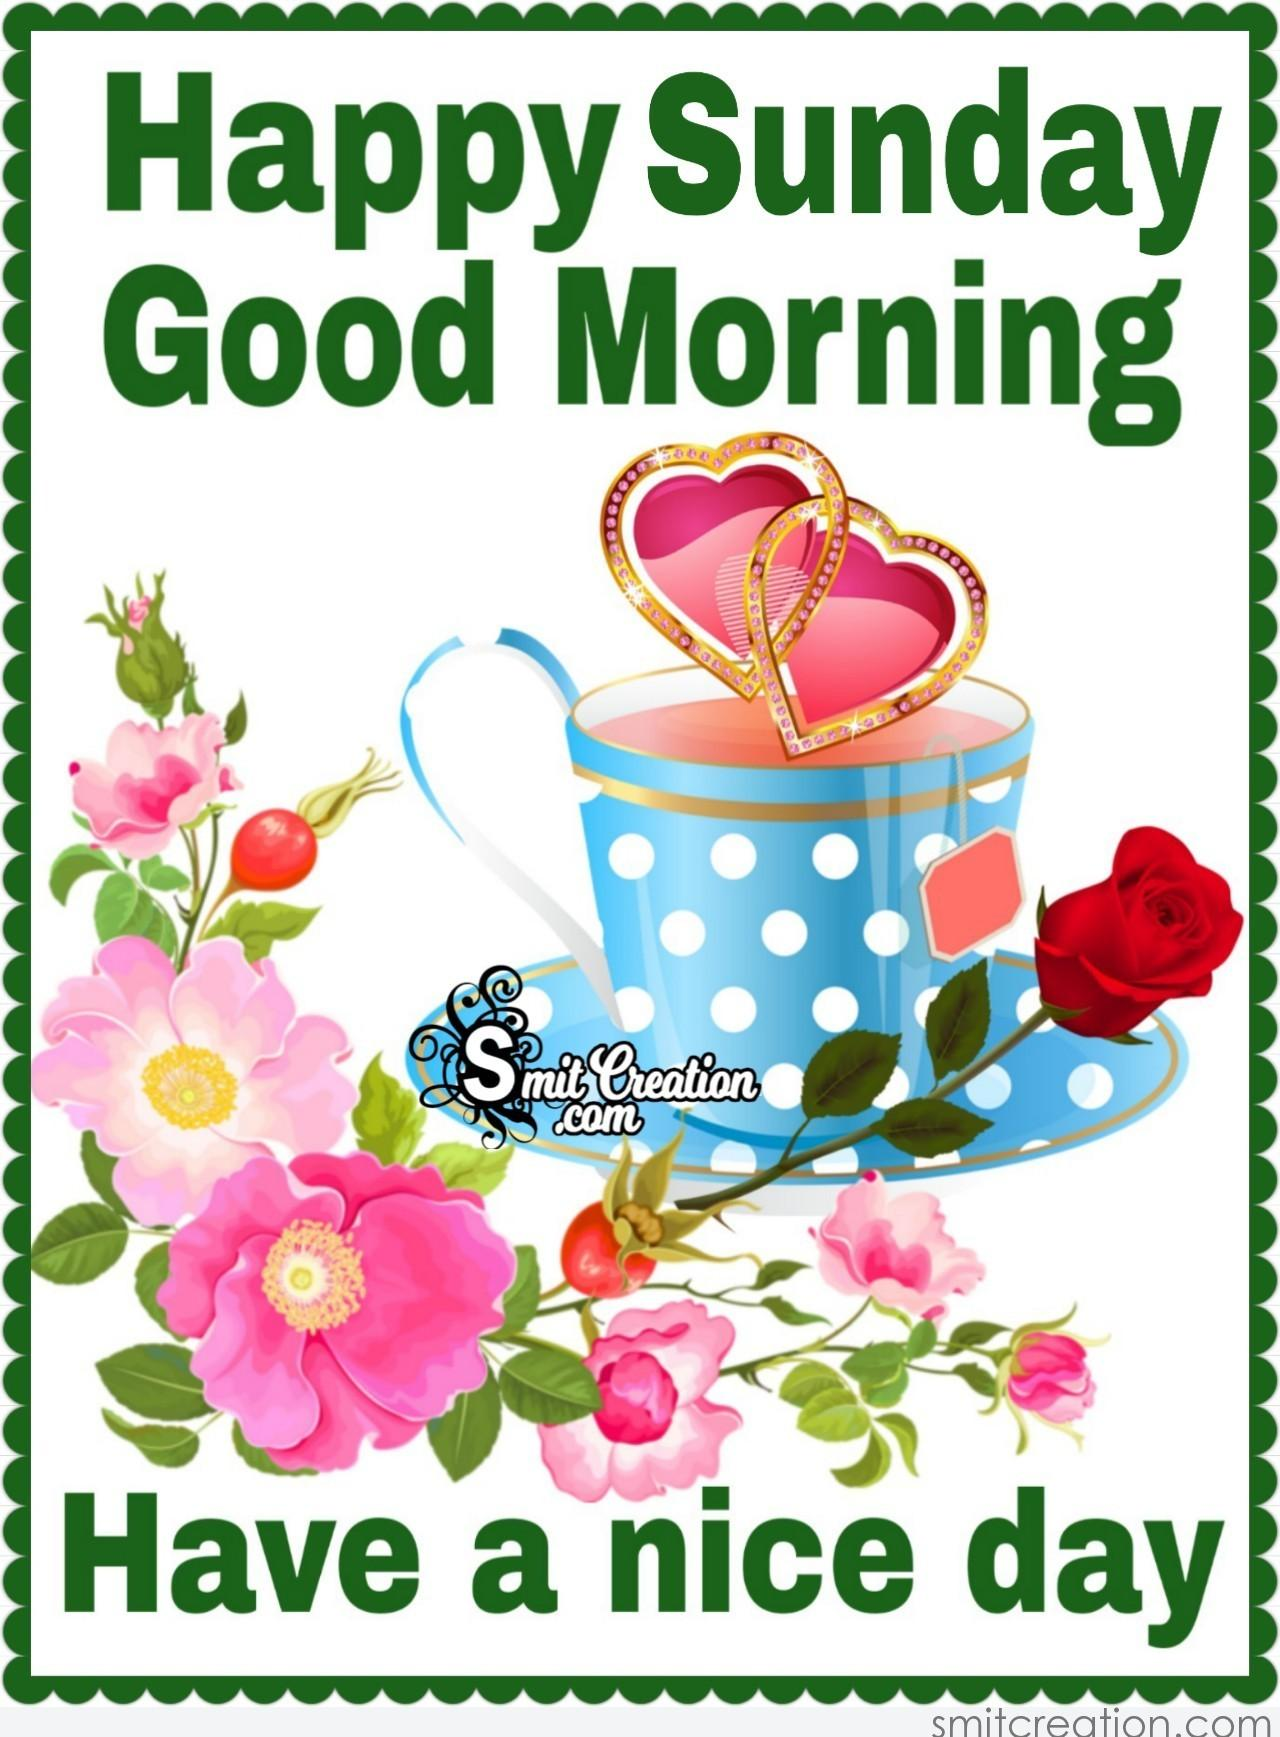 Happy Sunday Good Morning Have A Nice Day   SmitCreation.com